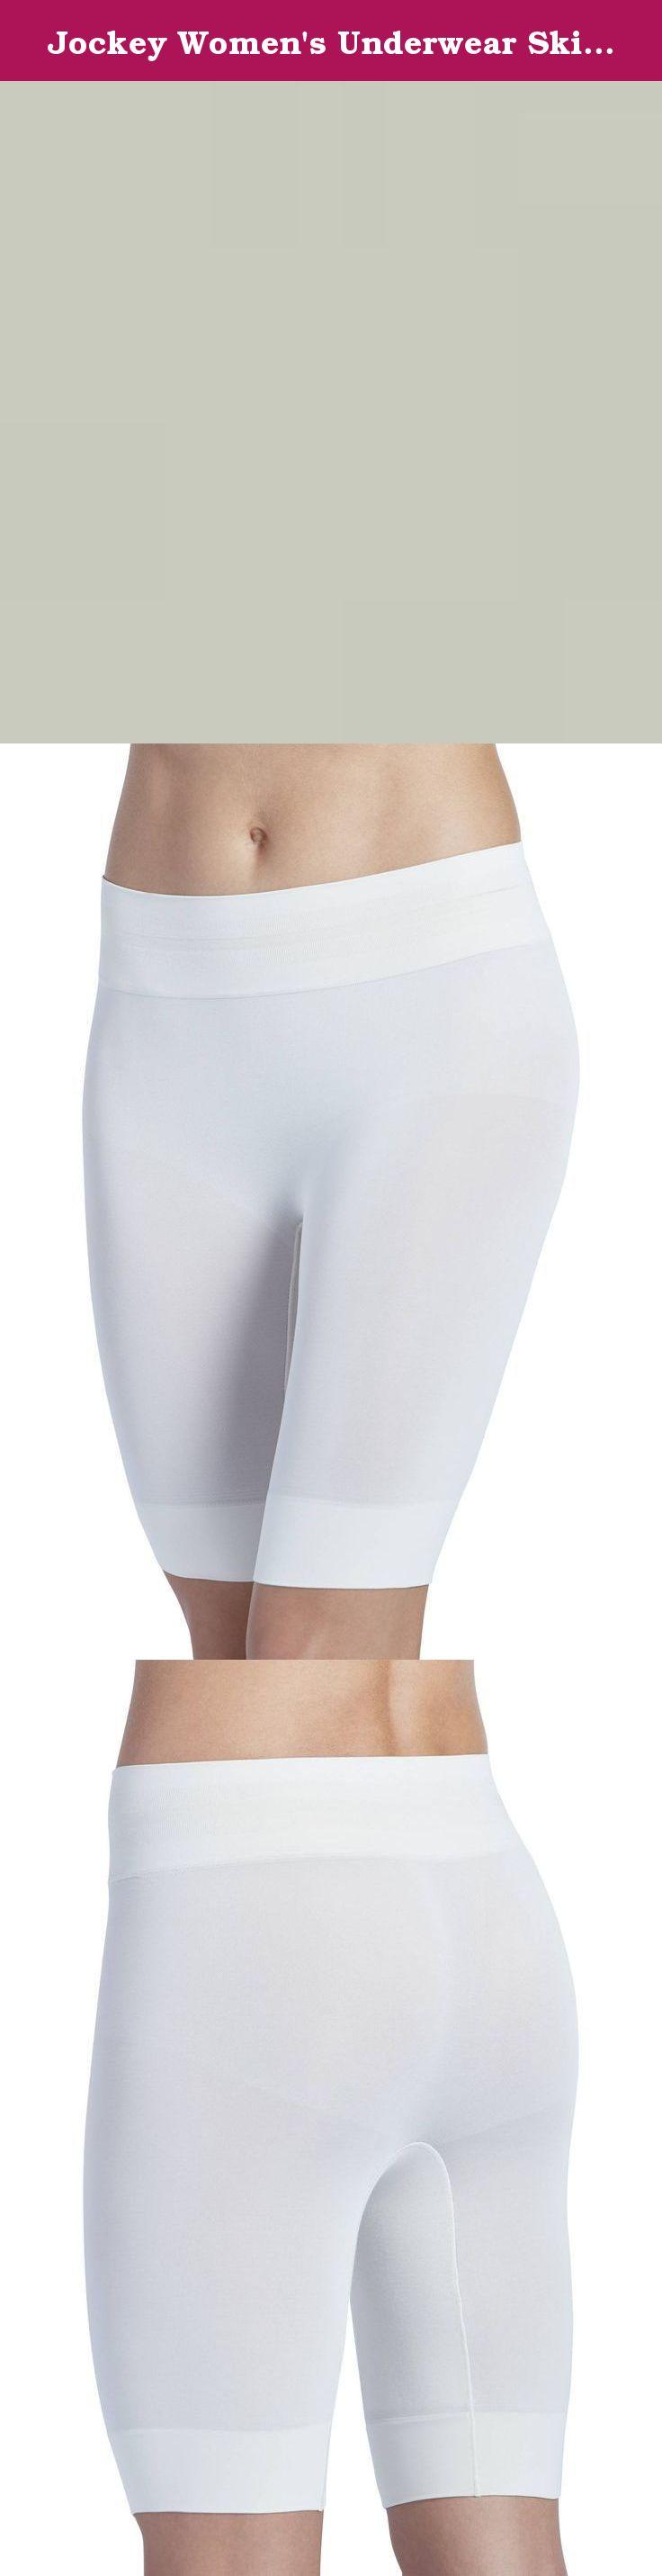 Pin On Boy Shorts Panties Lingerie Lingerie Sleep Lounge